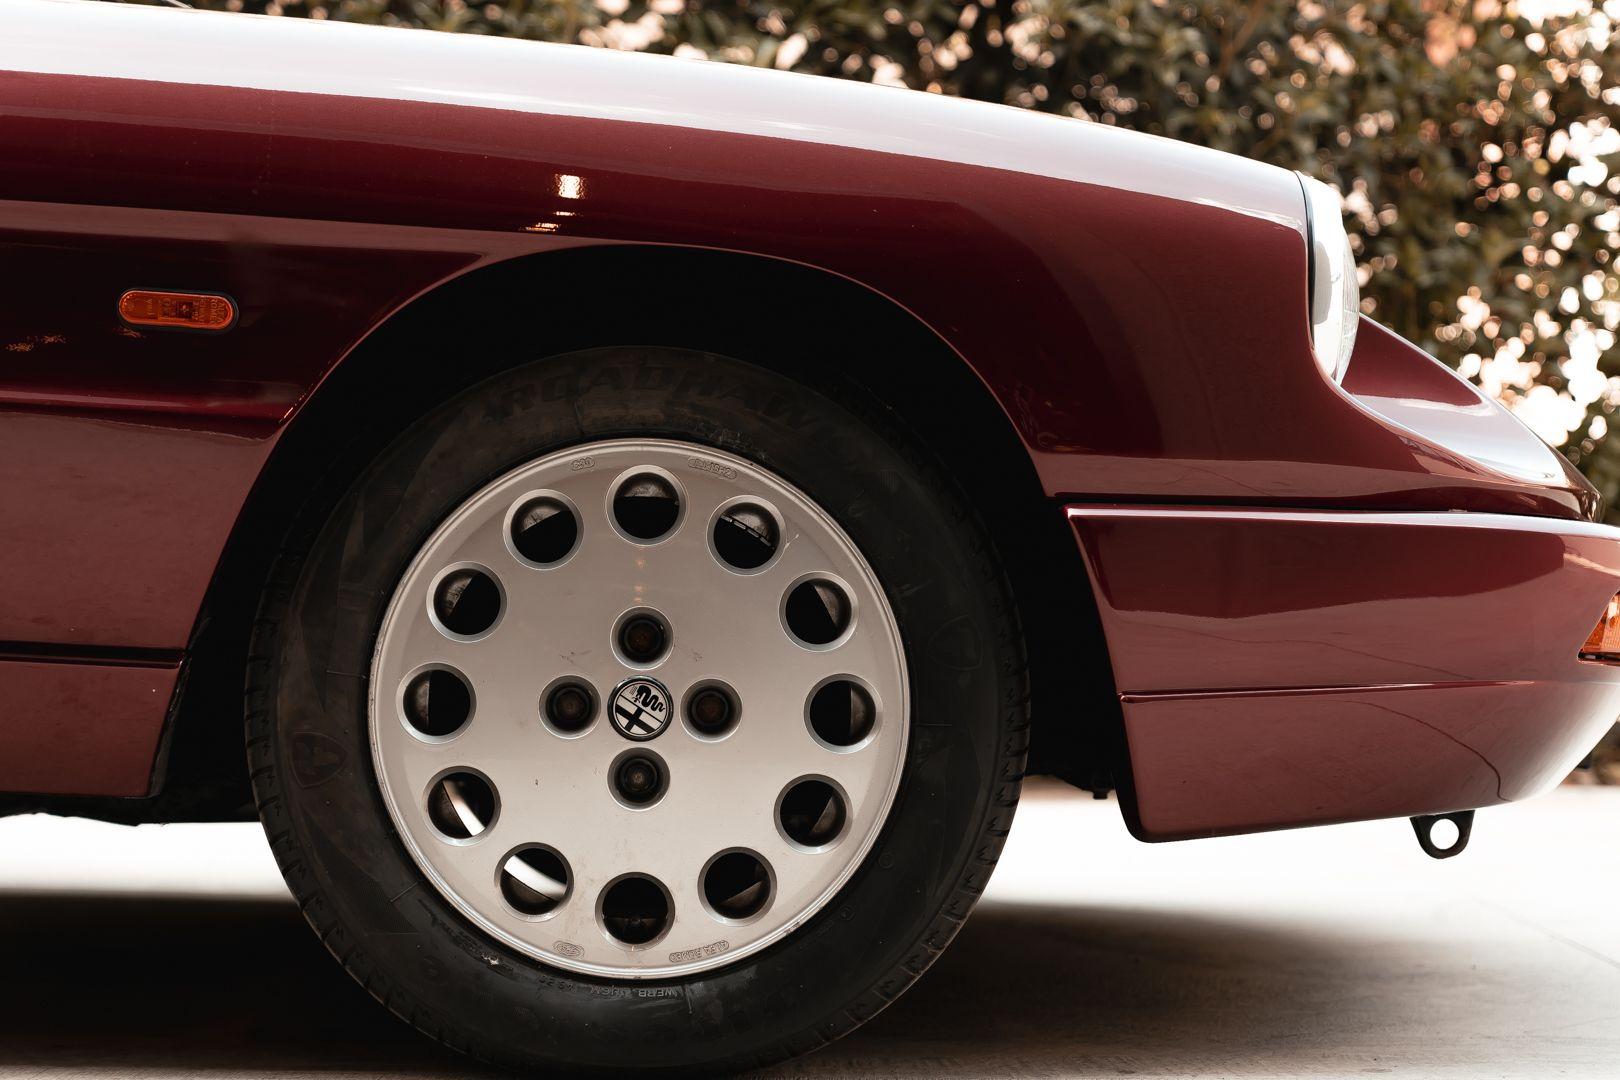 1990 Alfa Romeo Duetto 2000 IV Serie 79775